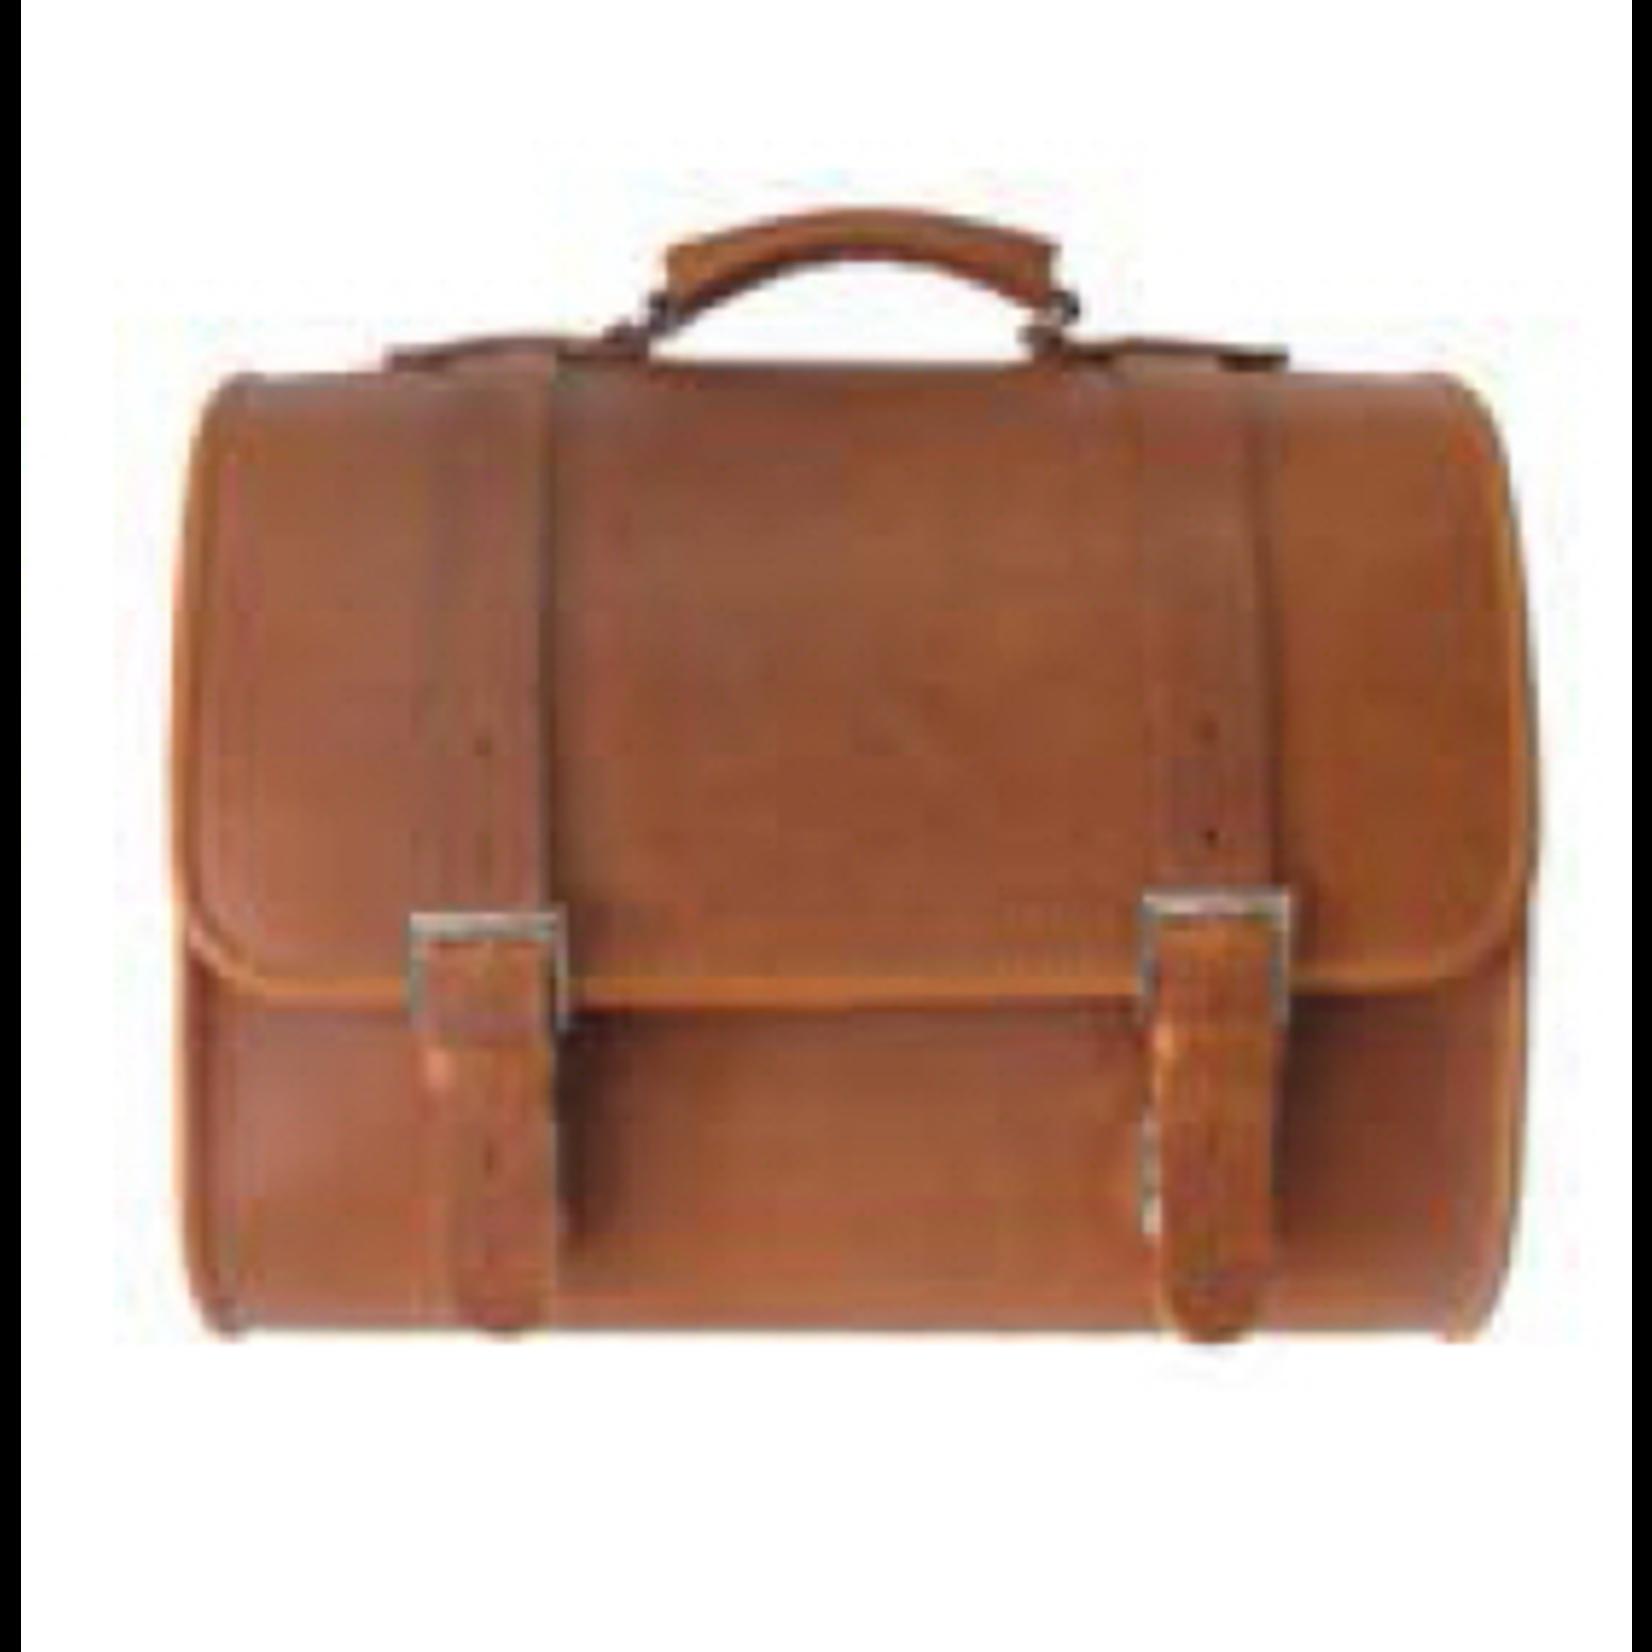 Accessories Top Case, Vespa Leather Bag Brown